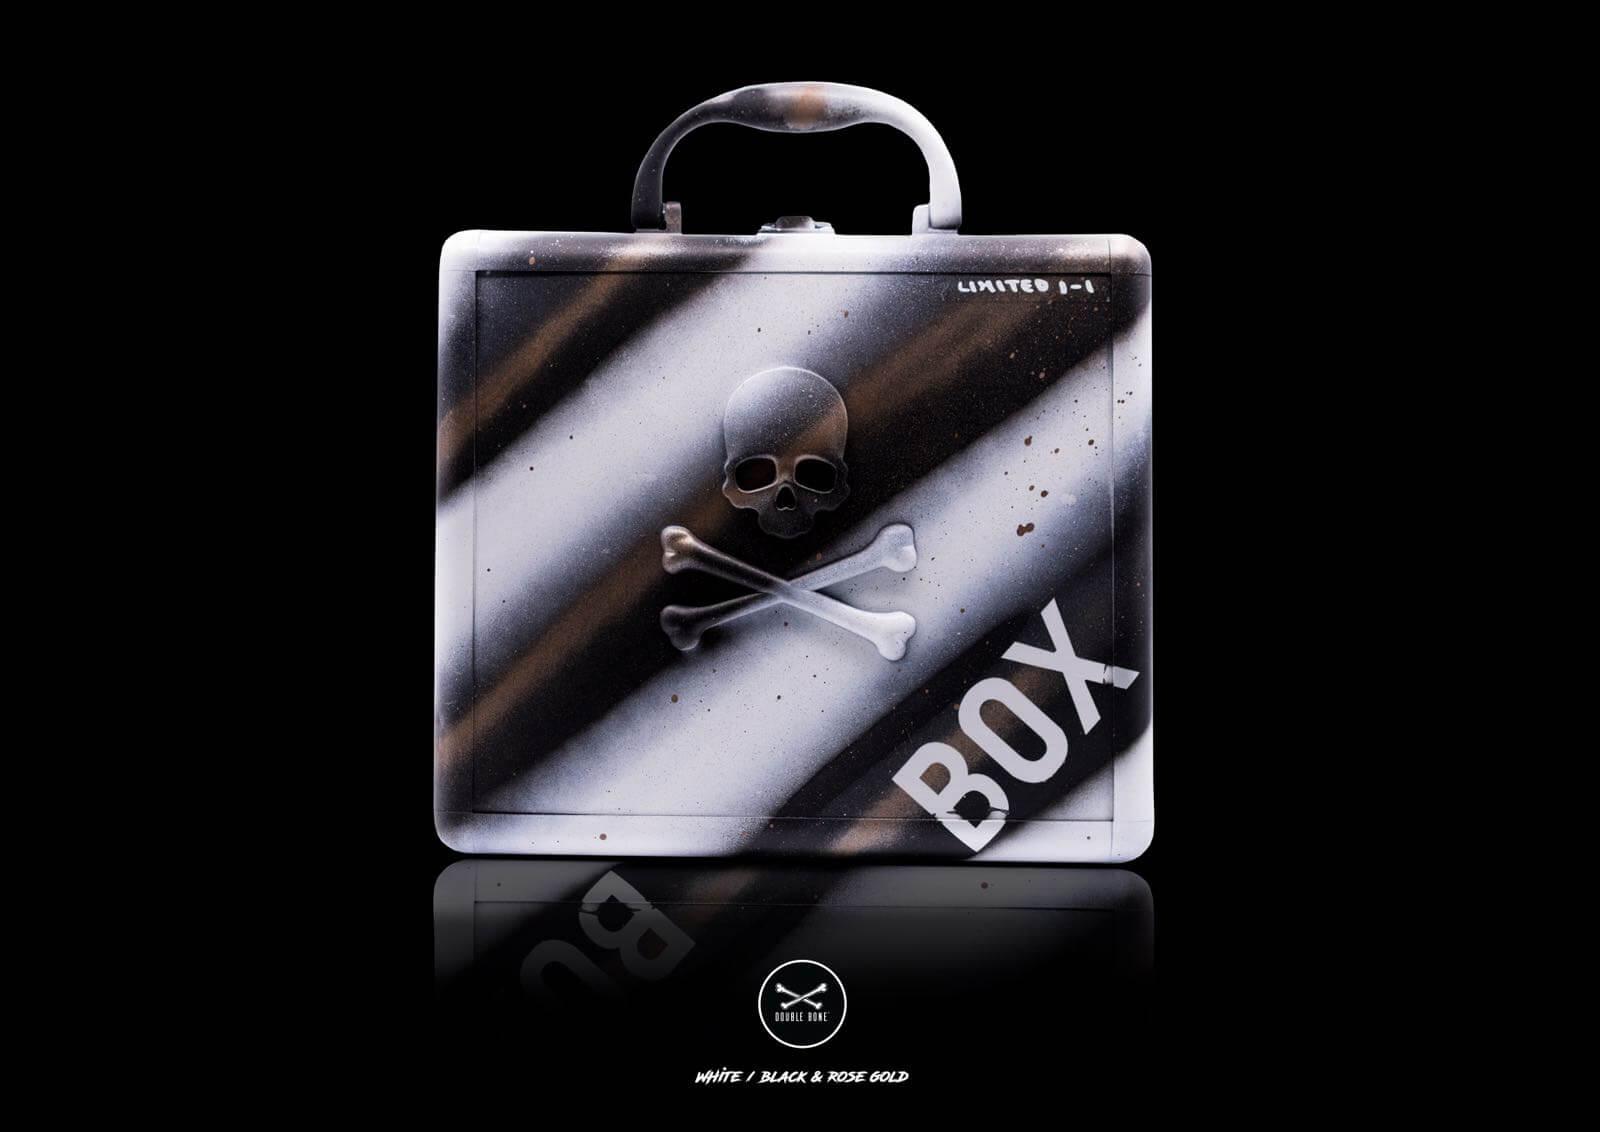 Aluminum Bracelet Case 8 Slots Black and White (1-1)